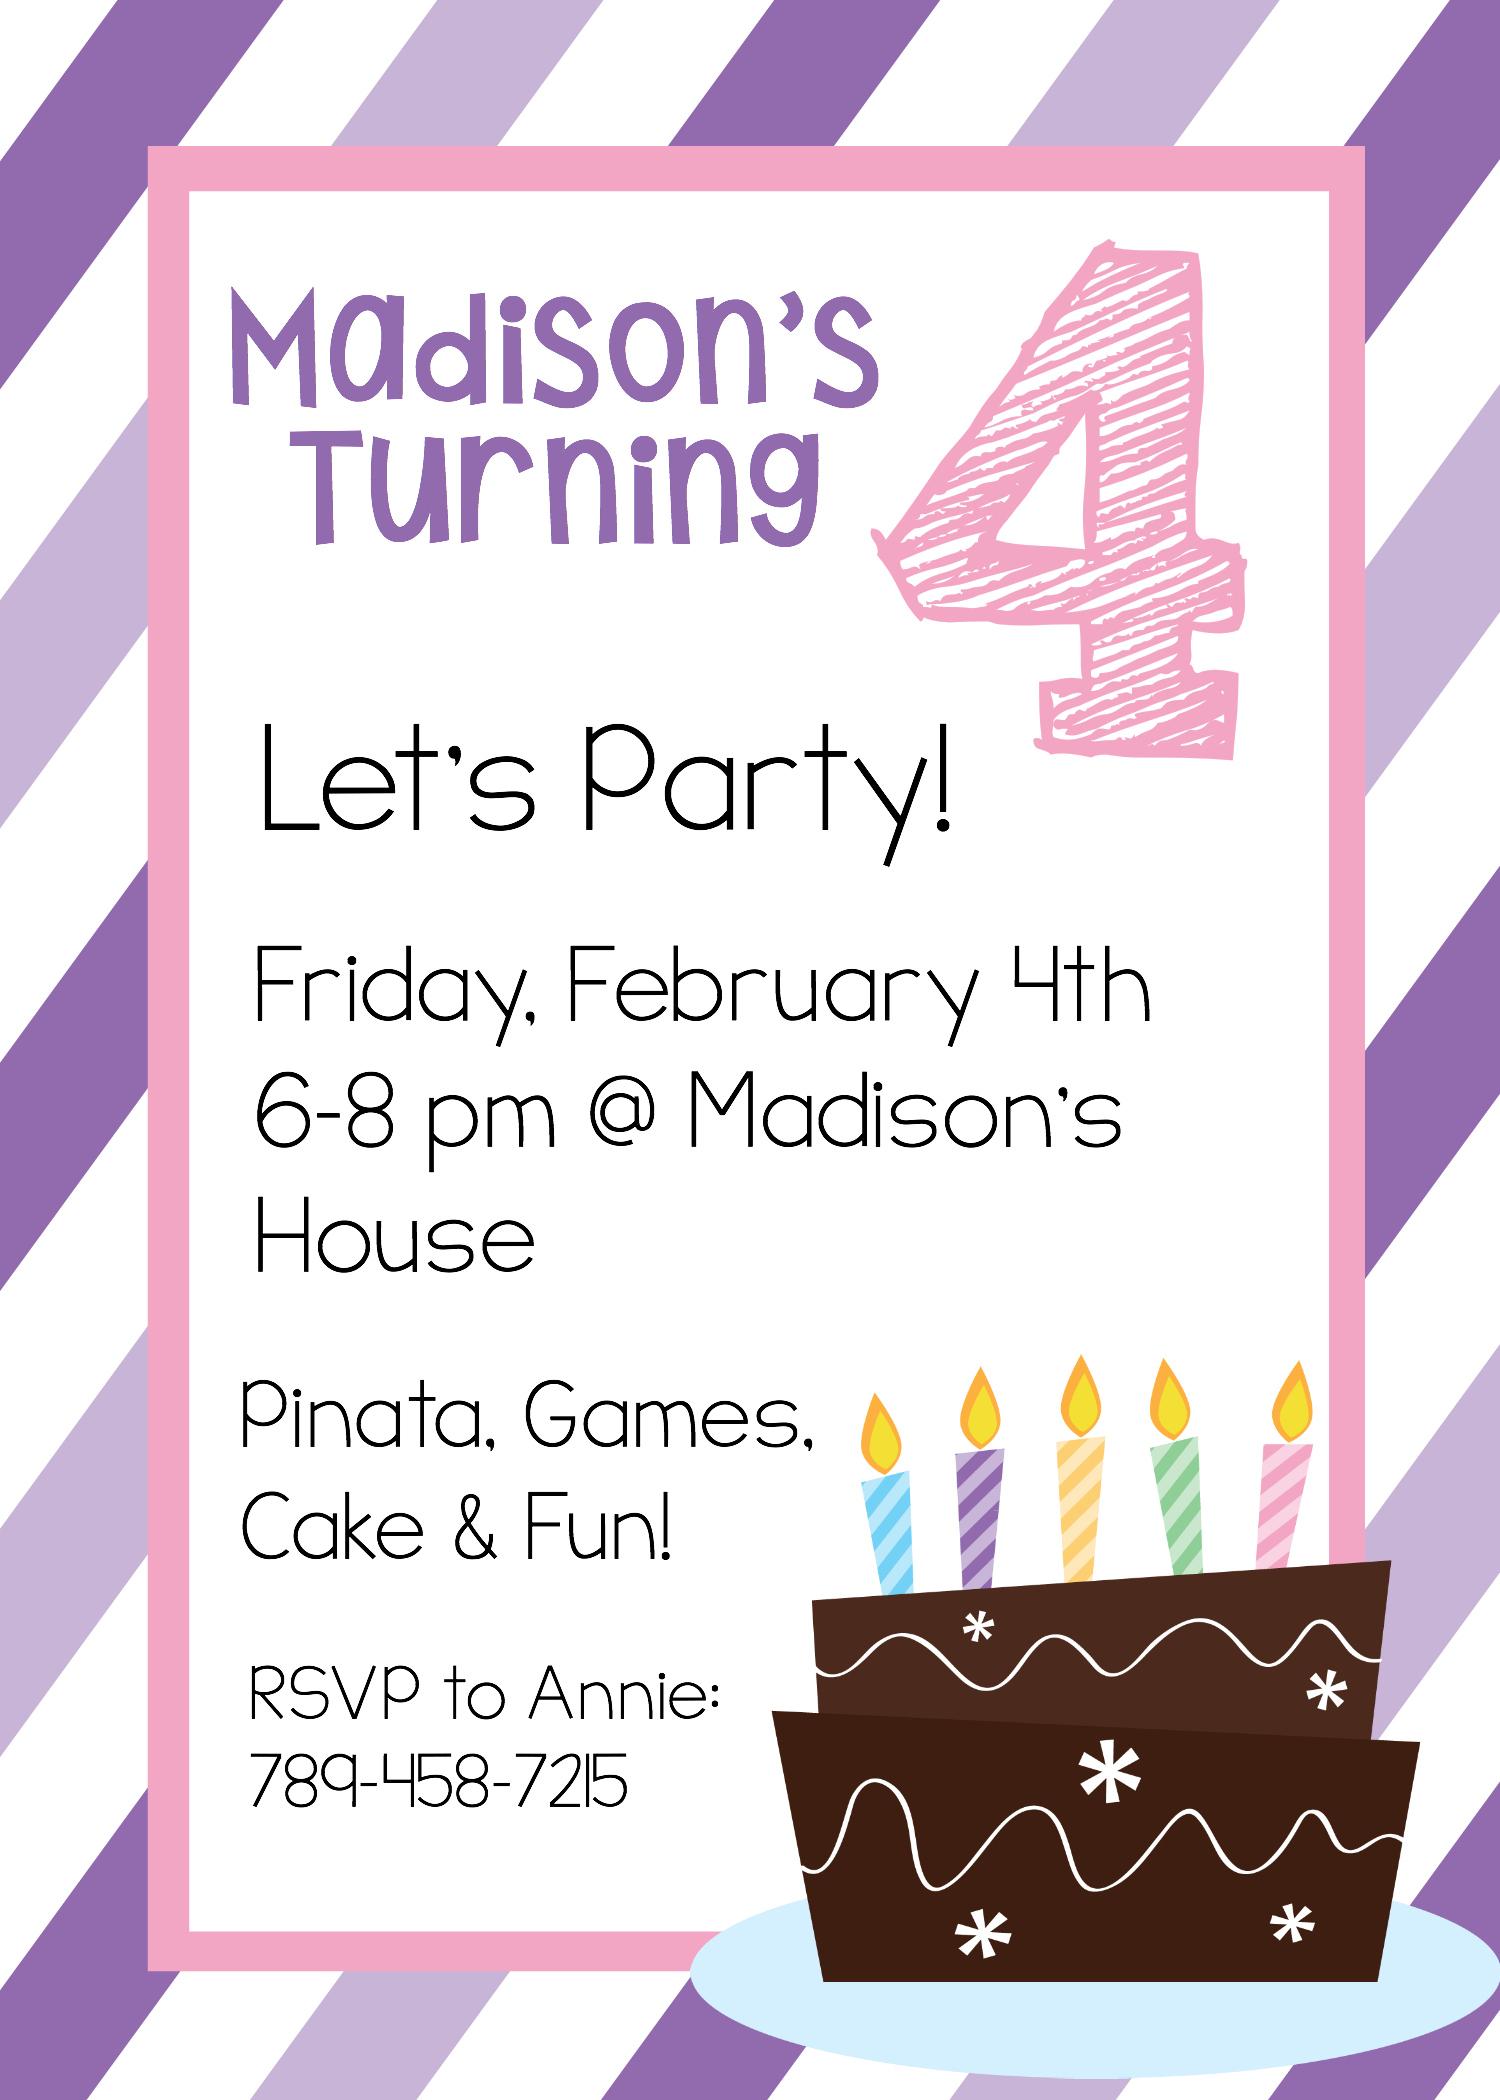 Free Printable Birthday Invitation Templates - Free Printable Birthday Invitation Cards